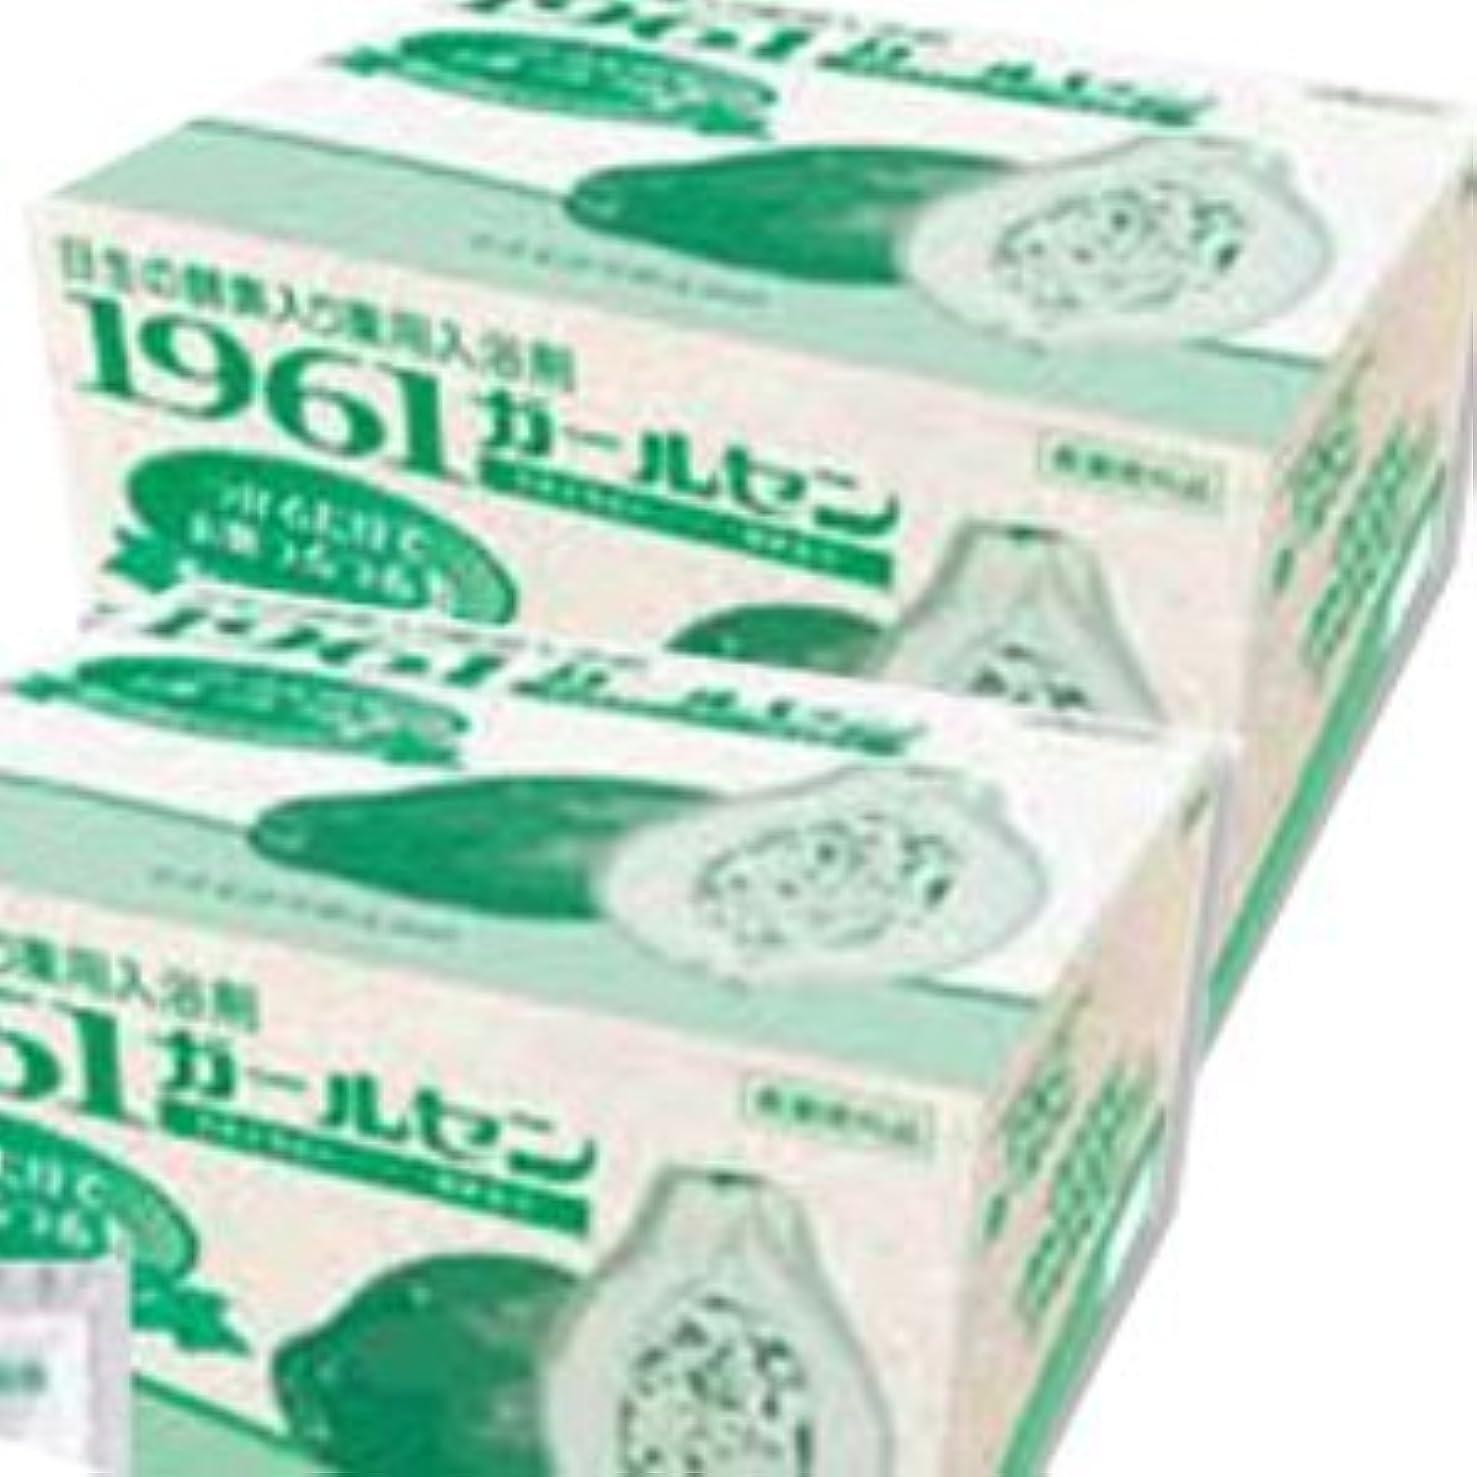 財政自己カポック日本生化学 薬用入浴剤 1961ガールセン (20g×60包)×2箱 (医薬部外品)